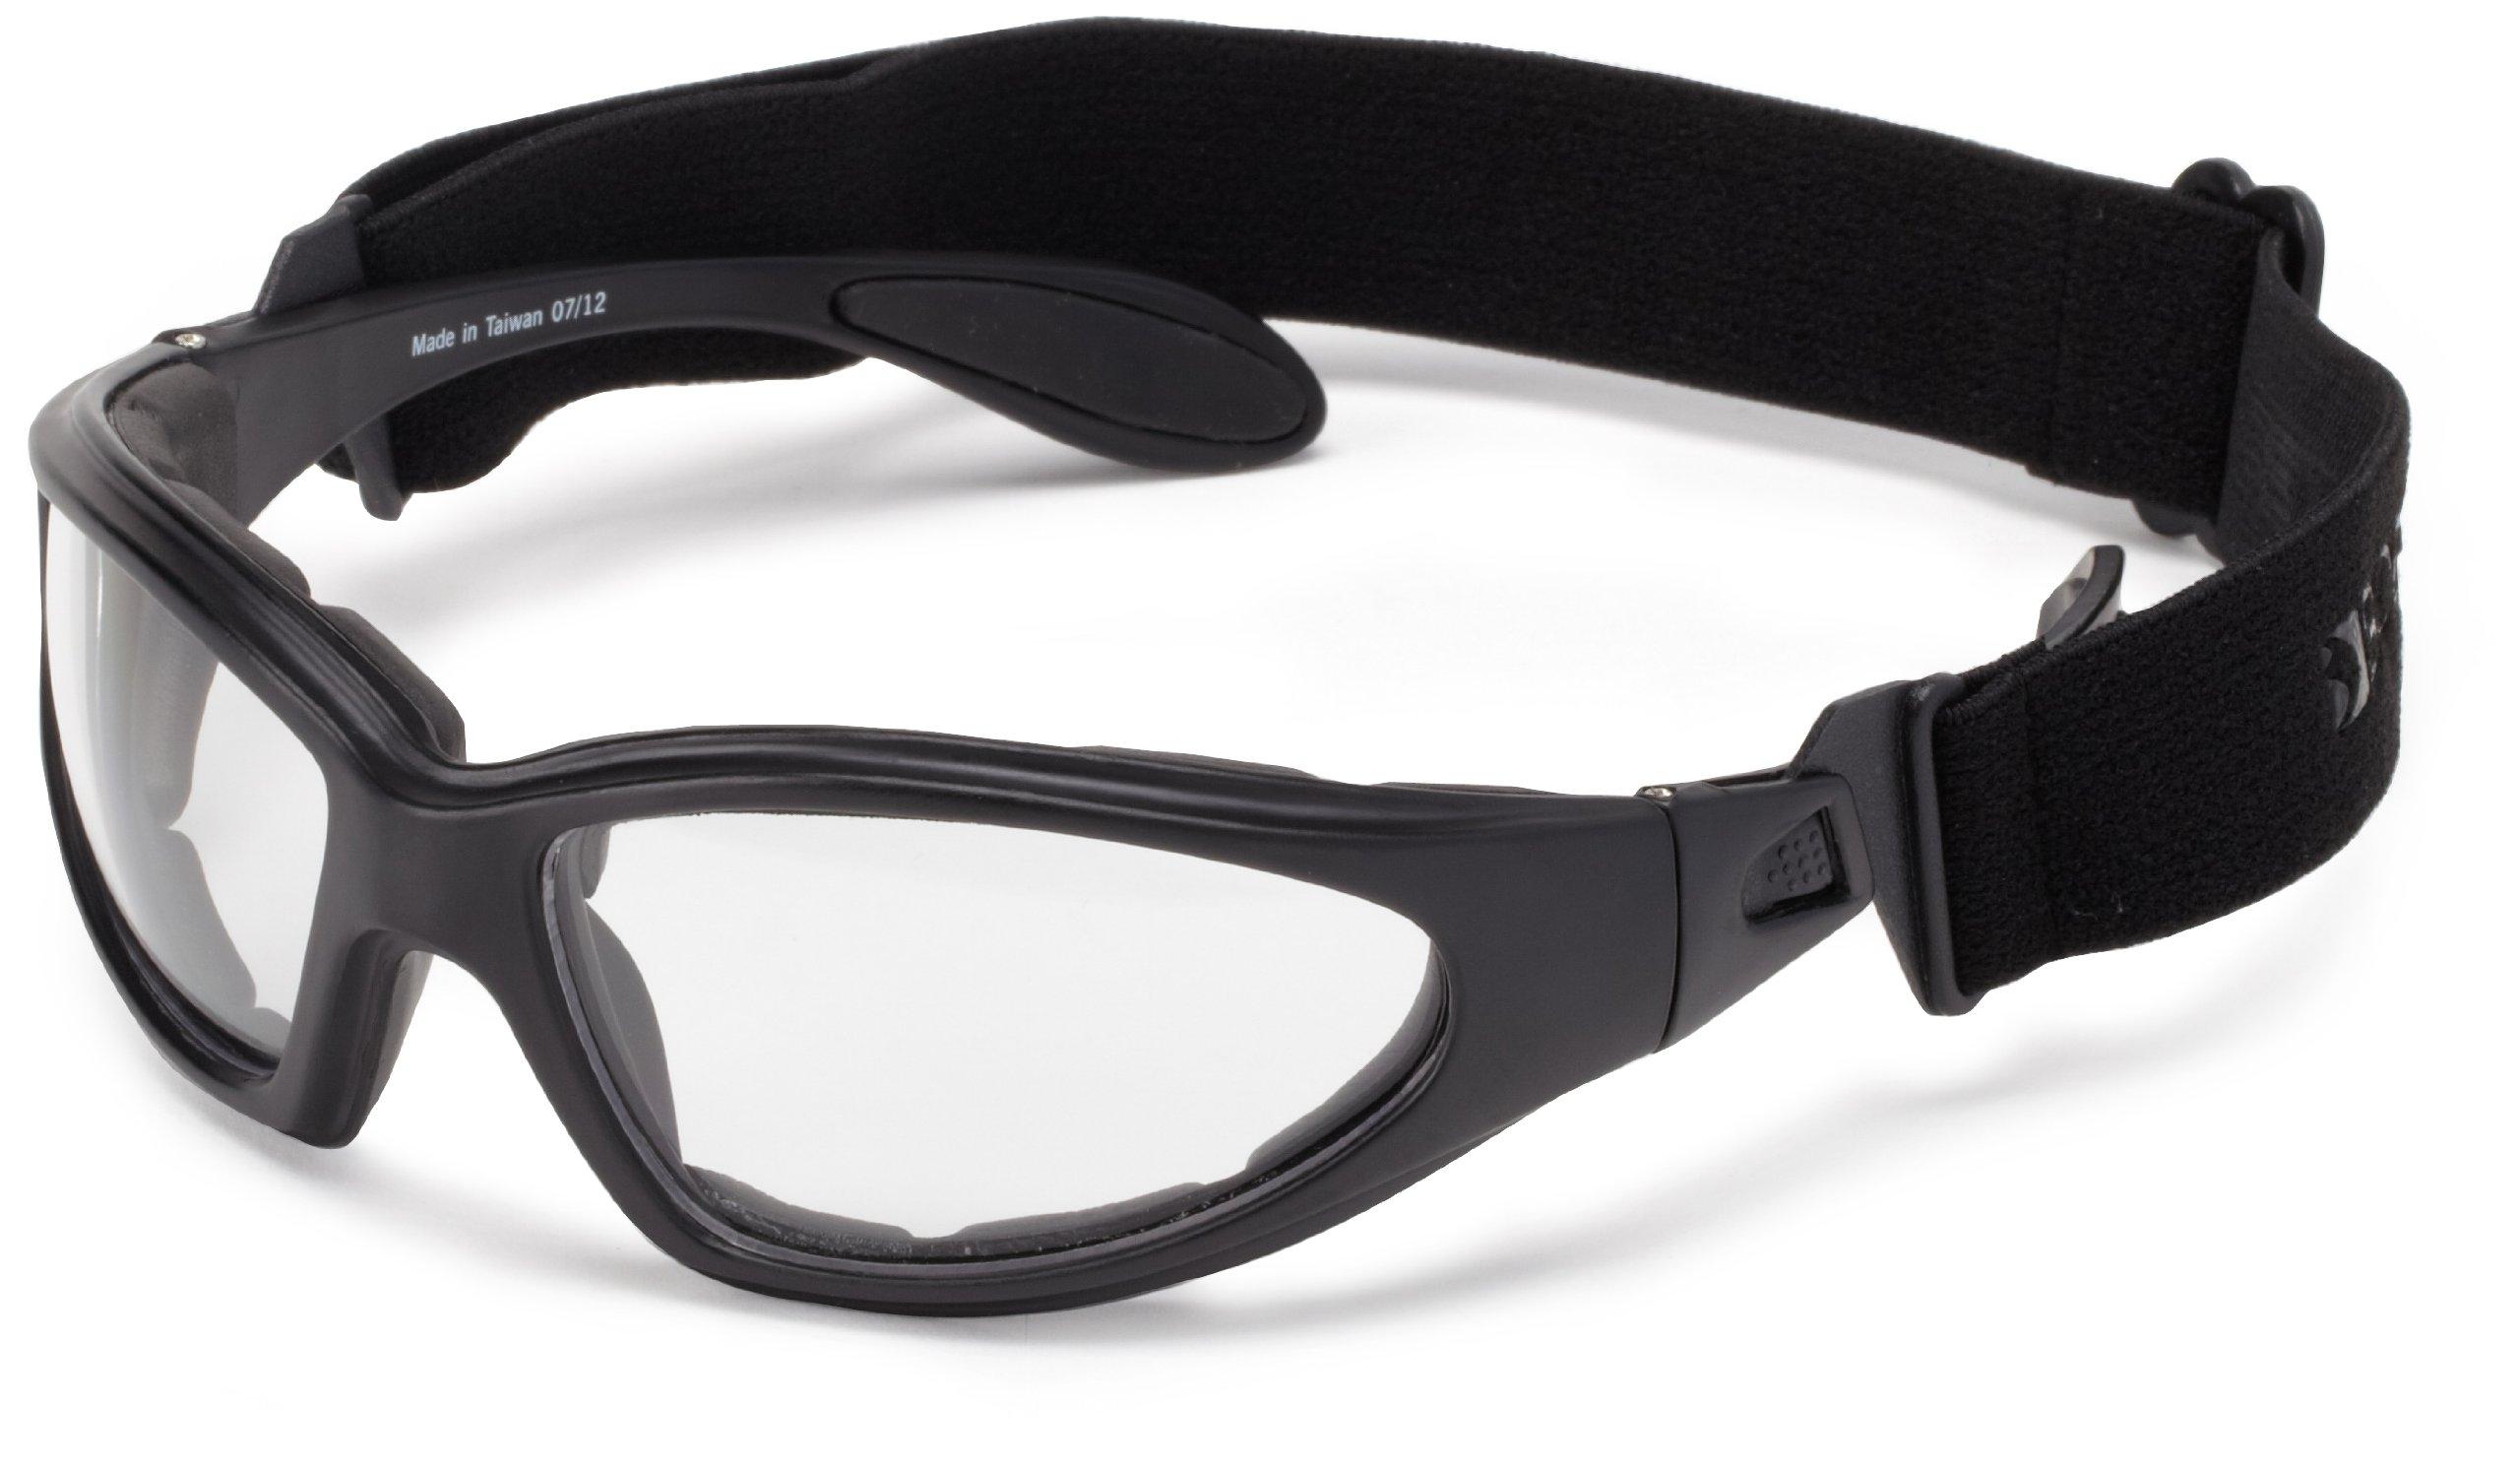 Bobster GXR Sport Sunglasses,Black Frame/Clear Lens,one size by Bobster (Image #6)